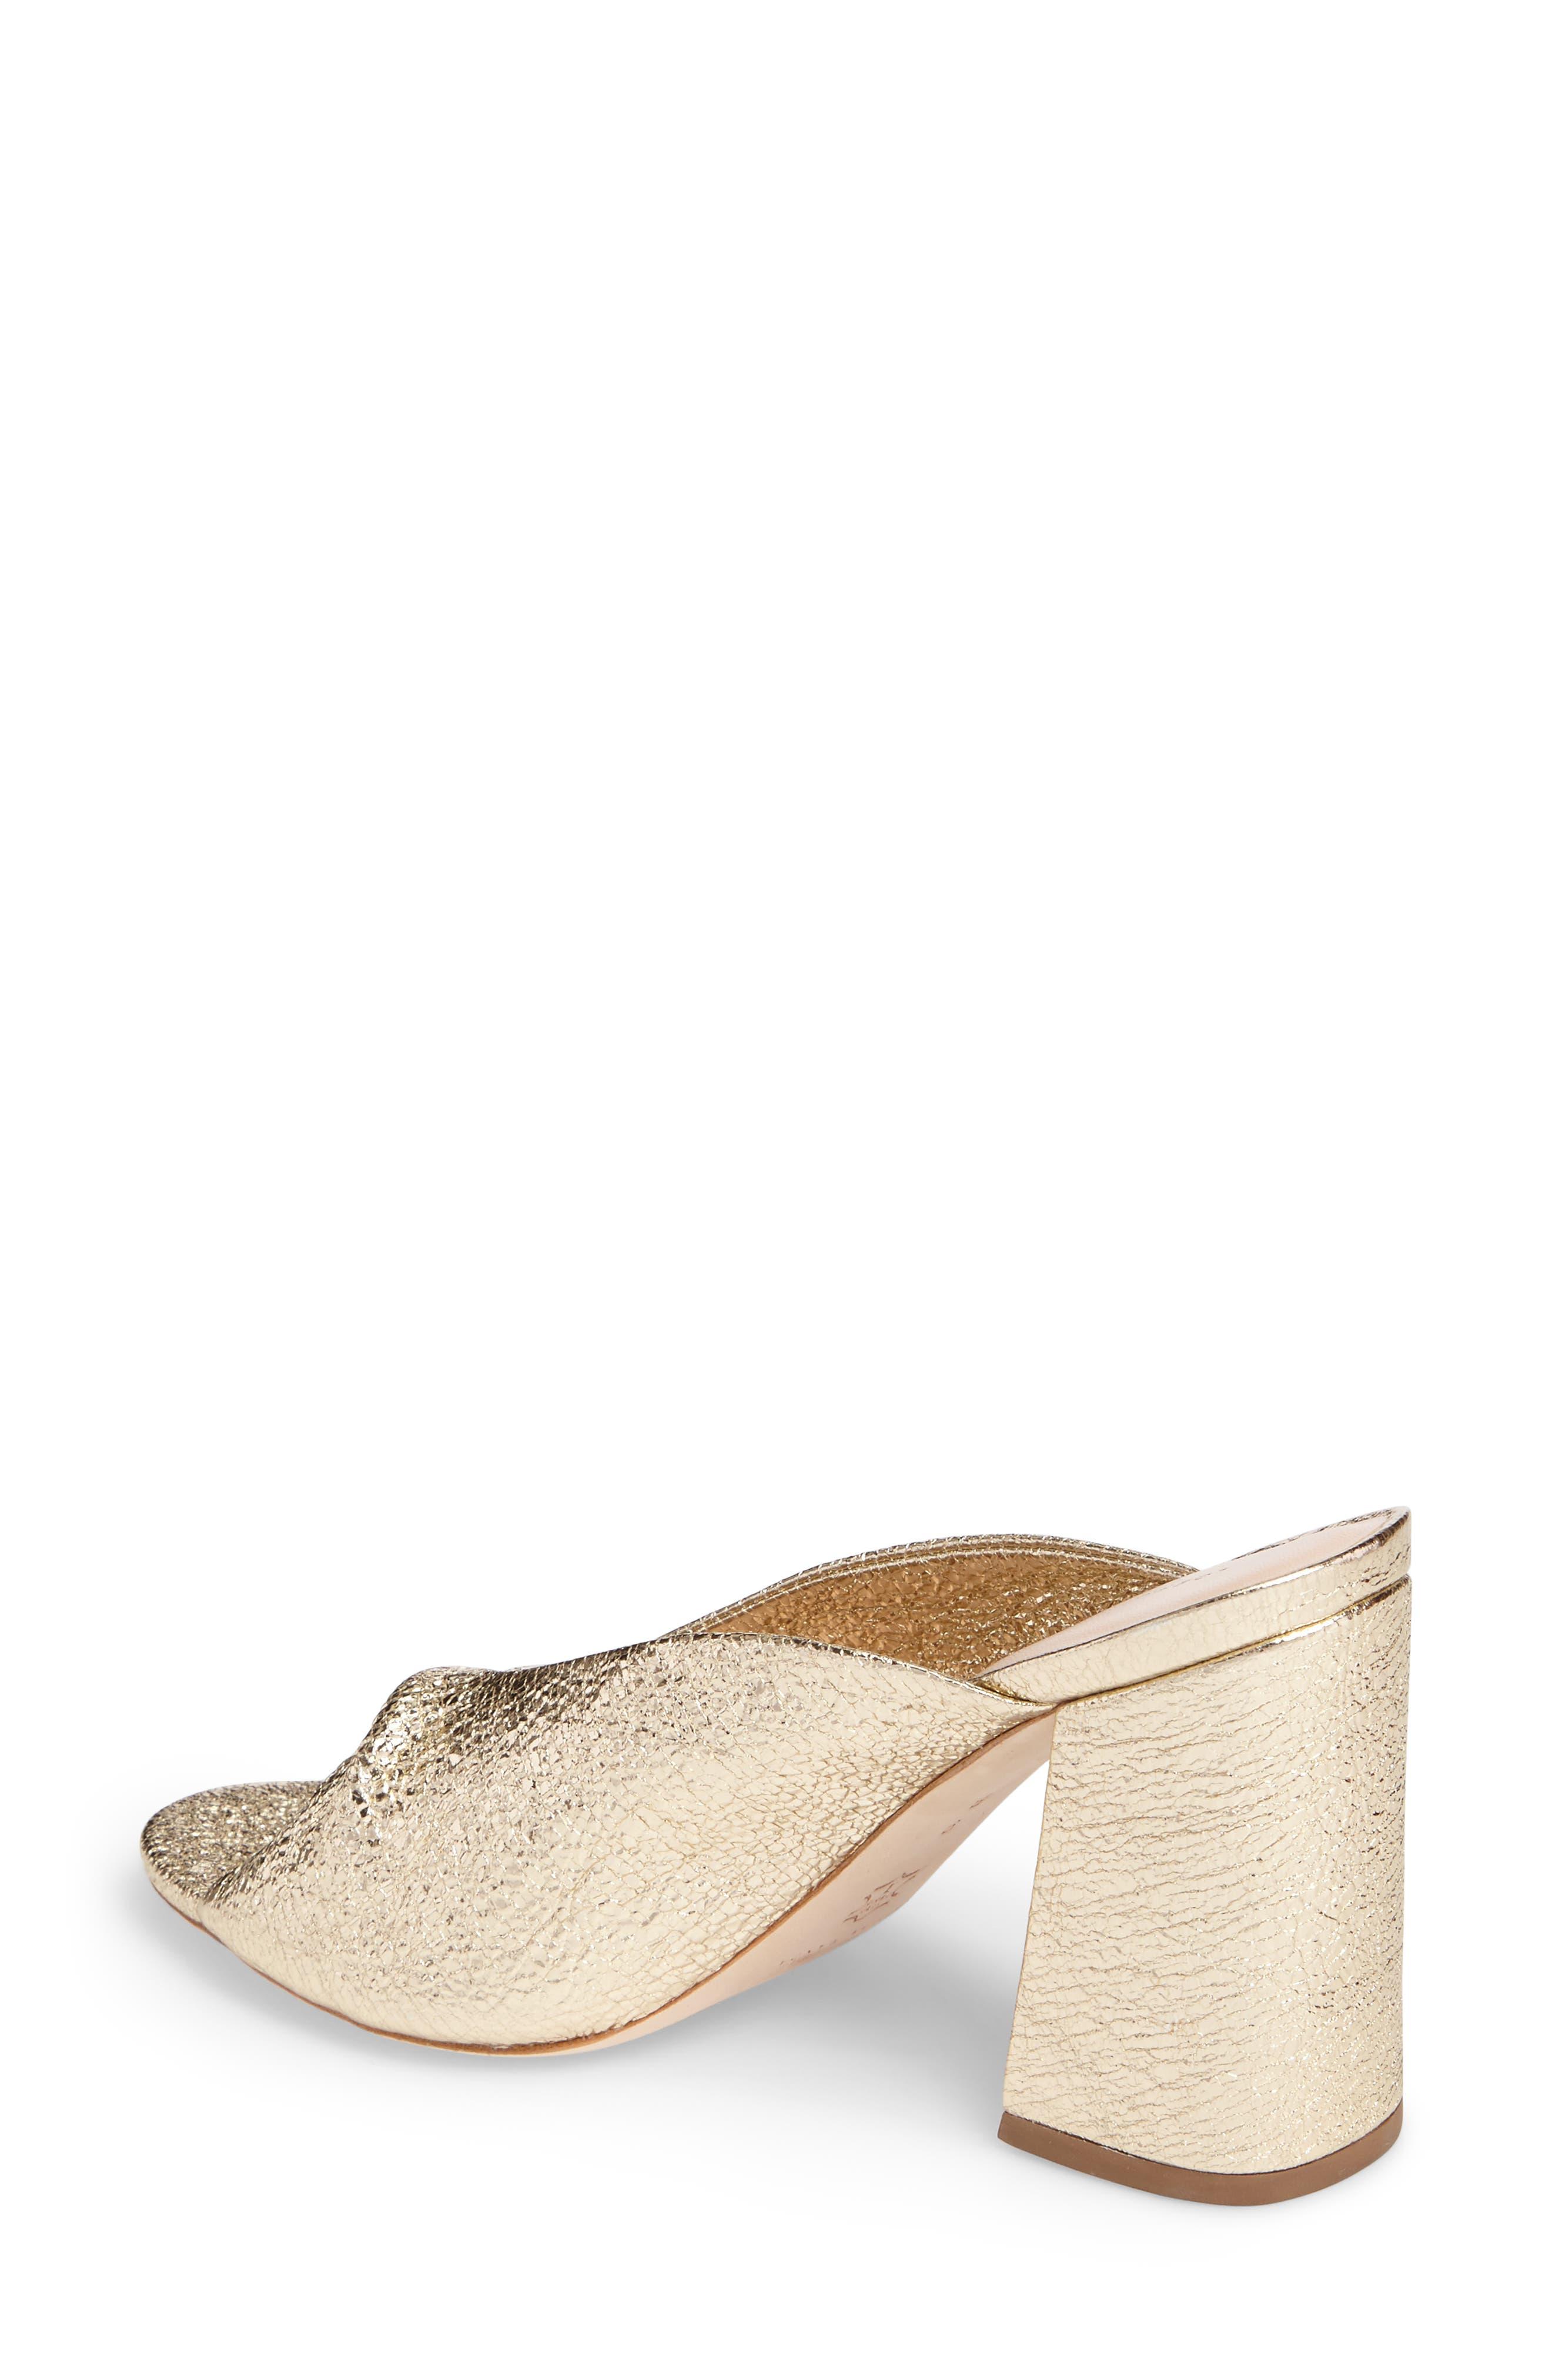 Laurel Slide Sandal,                             Alternate thumbnail 2, color,                             Champagne